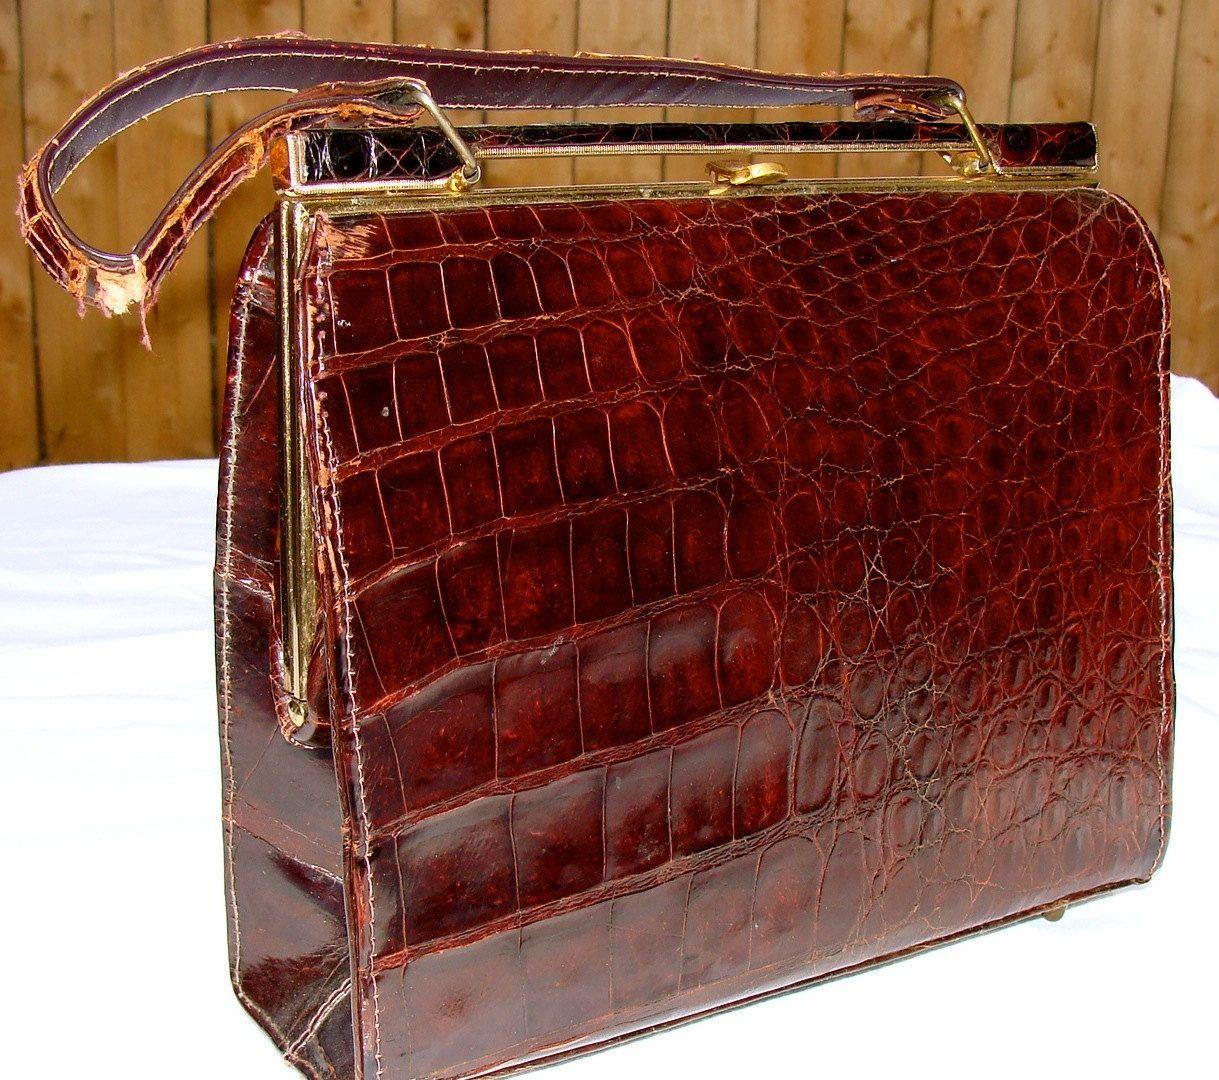 718784aab2de  45 Vintage Alligator Purse 1950s 1940s Genuine Alligator Mid Century  Vintage Handbag by undercoverPOPULAR on Etsy